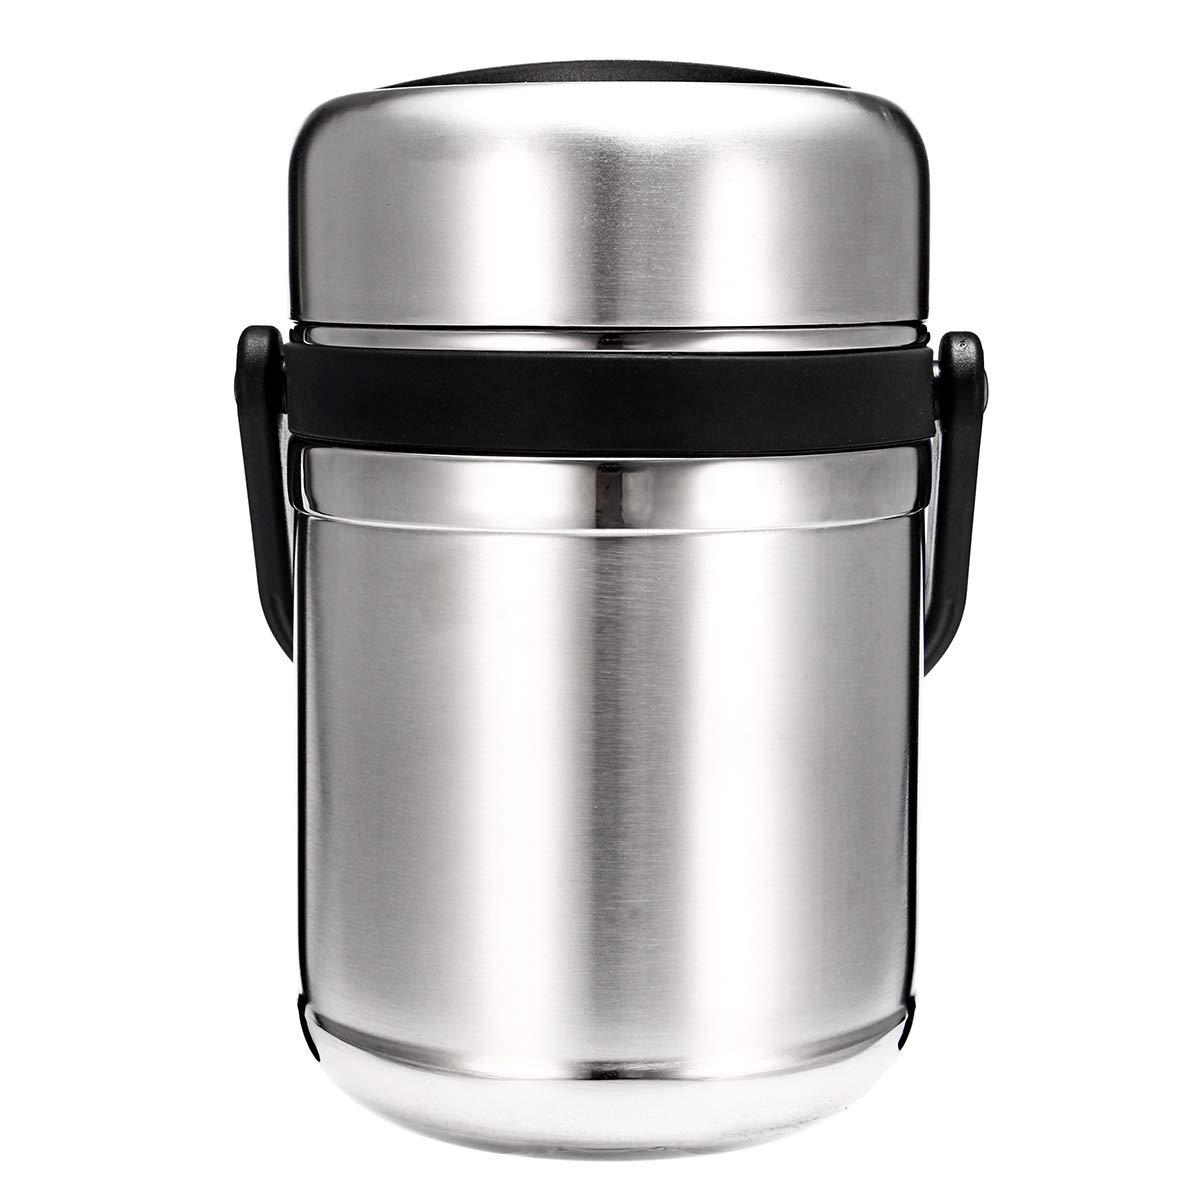 Rosafishs Outdoor Edelstahl-Wanderung Vakuum Lunch Box Edelstahl Hot Food Container Container Food Warmespeichung mit Licht - 0db9d0